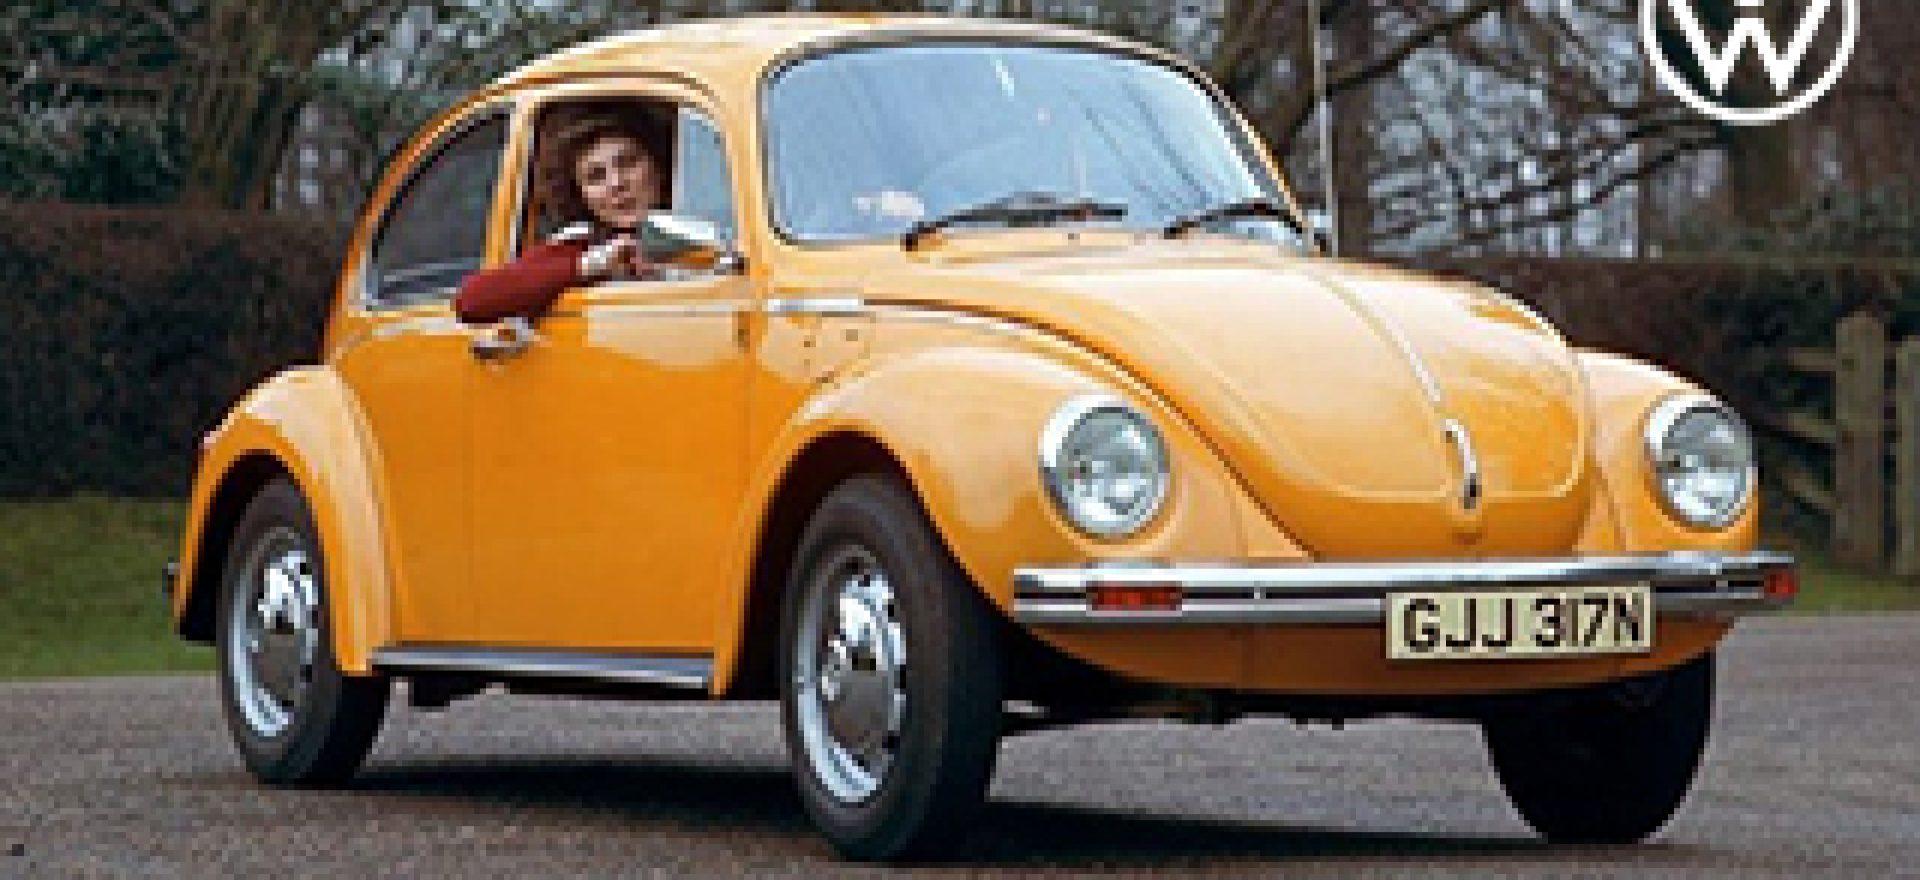 top-10-mau-beetle-mang-tinh-bieu-tuong-nhat-moi-thoi-dai-avatar